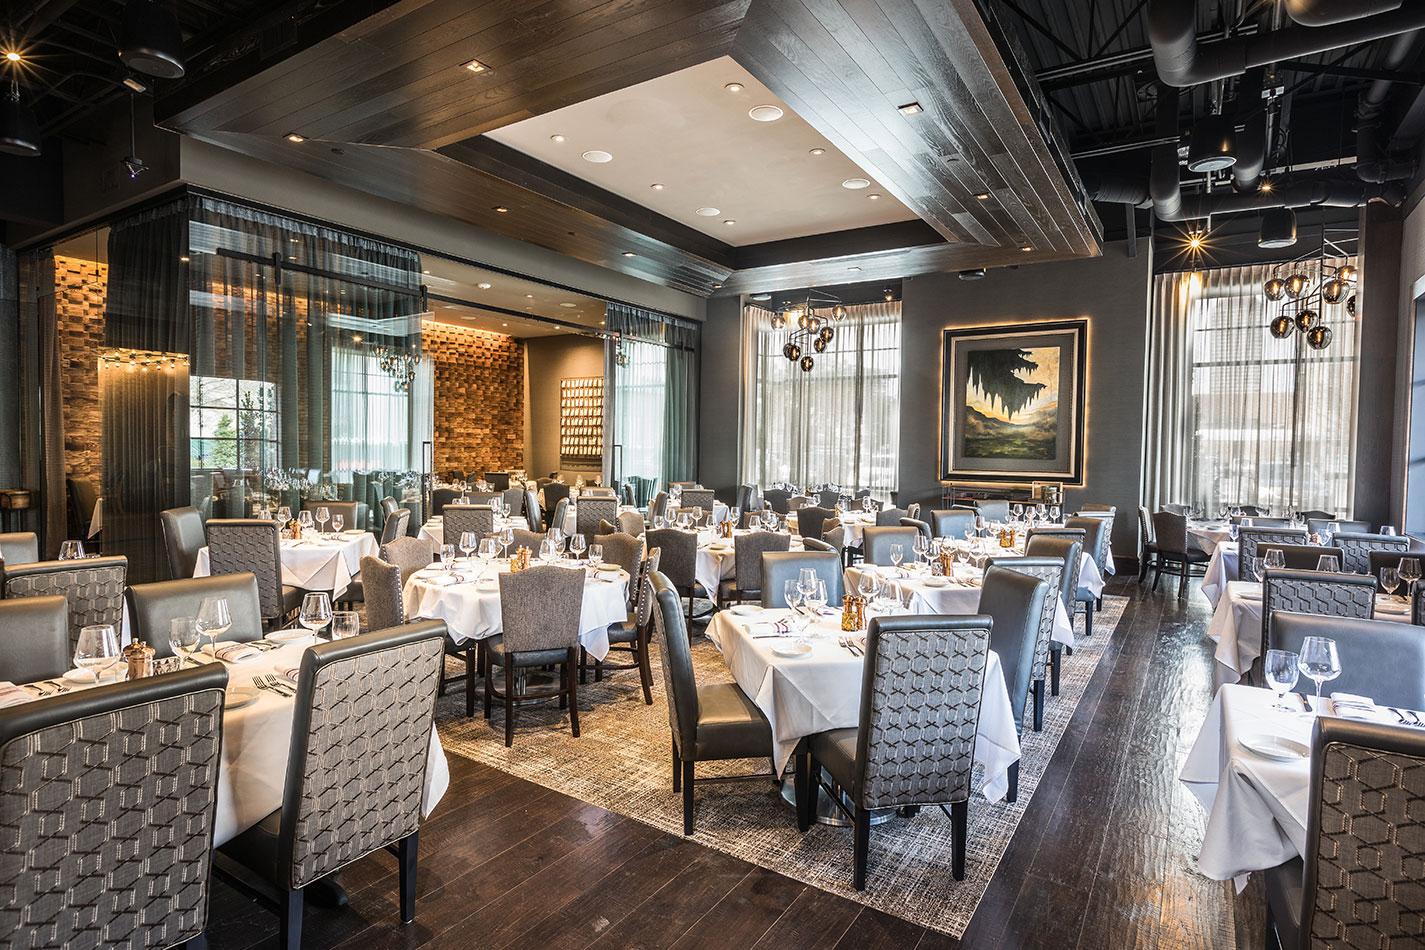 WILLIE G'S HOUSTON Hospitality Restaurant Interior Design Elegant Dining Area